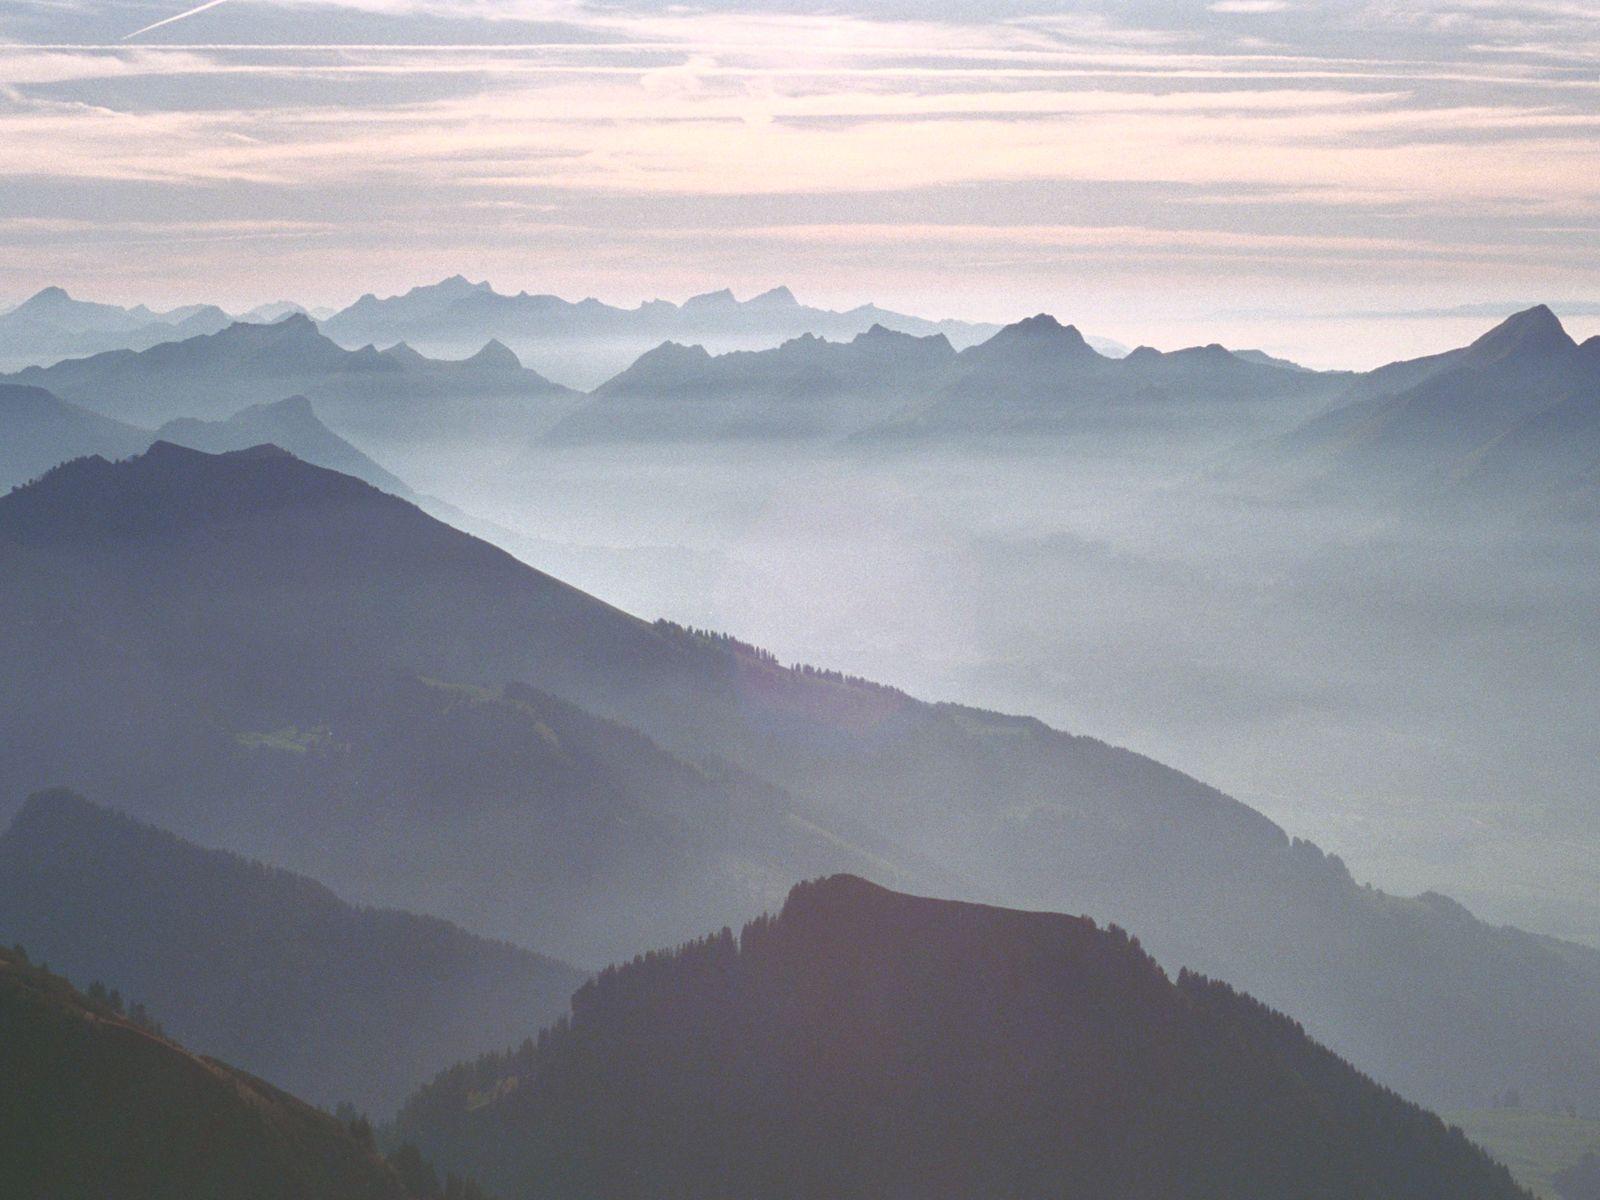 Fantastic Wallpaper Mountain Fog - bee600e35b82acb886a82763c613191b  Snapshot_42754.jpg